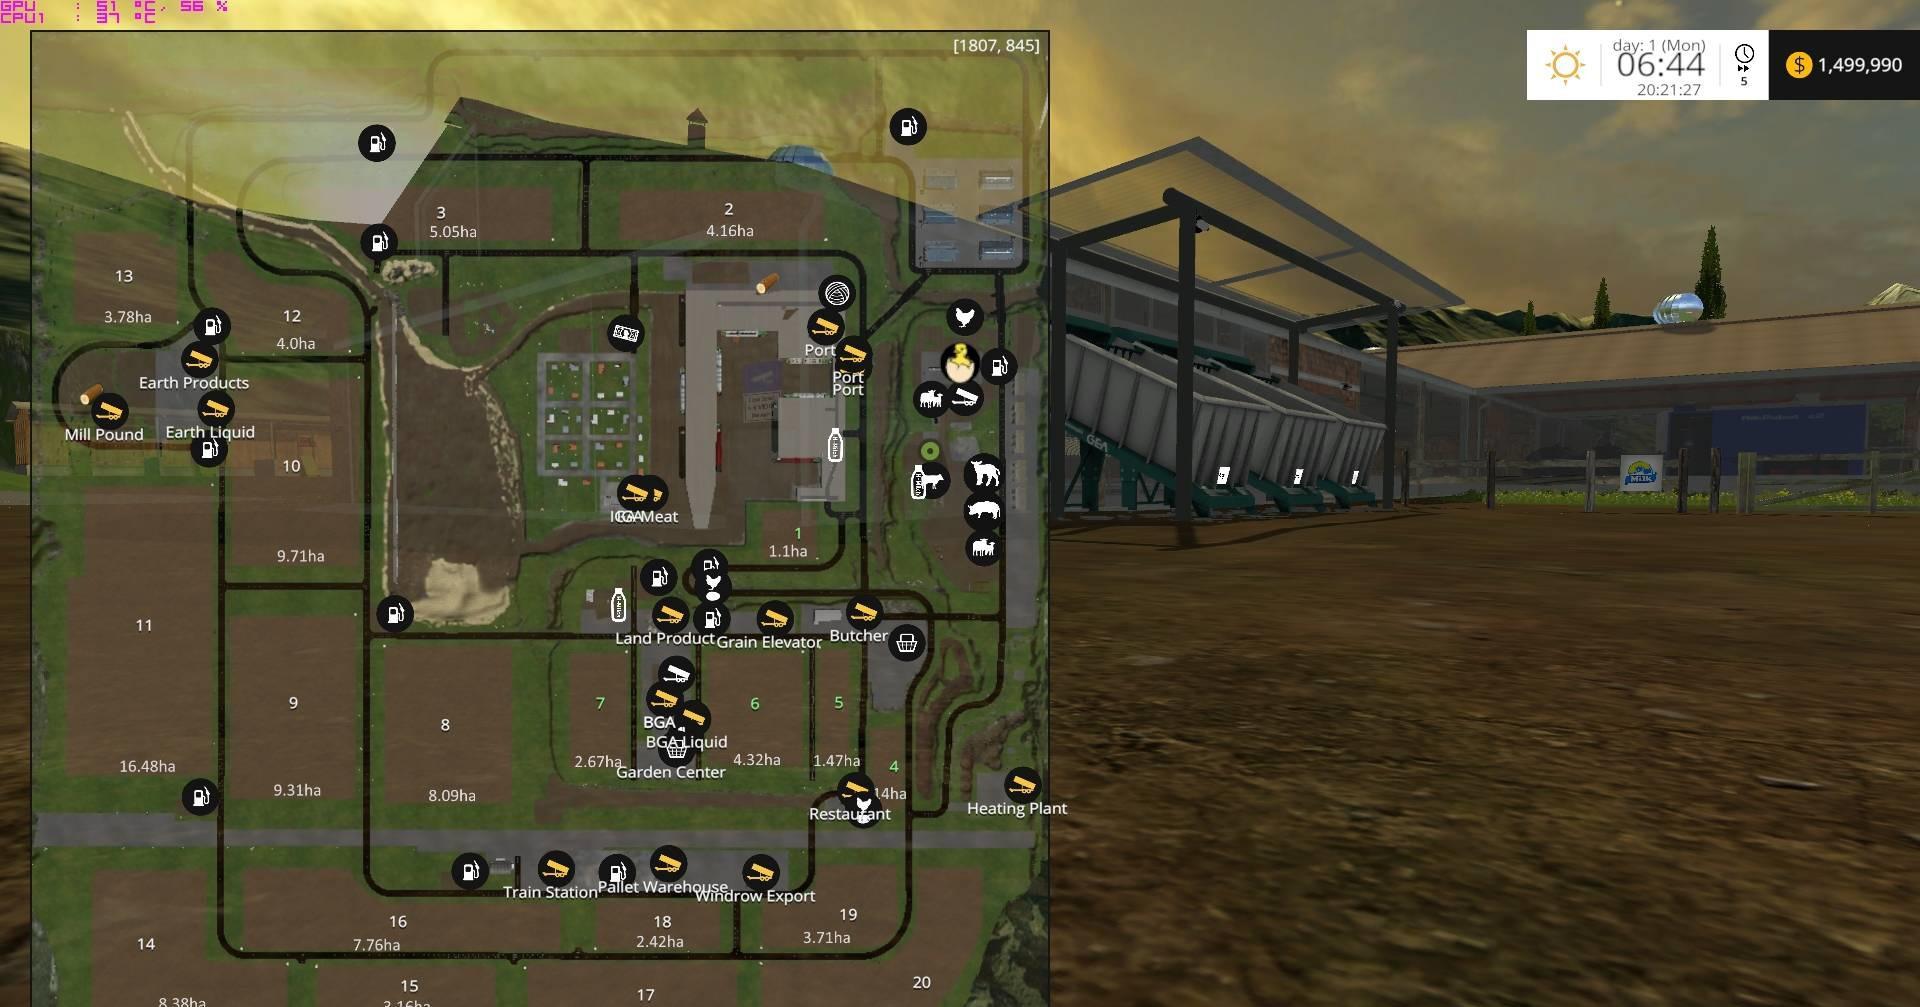 Canadian Rocky Map v 10 GamesModsnet FS17 CNC FS15 ETS 2 mods